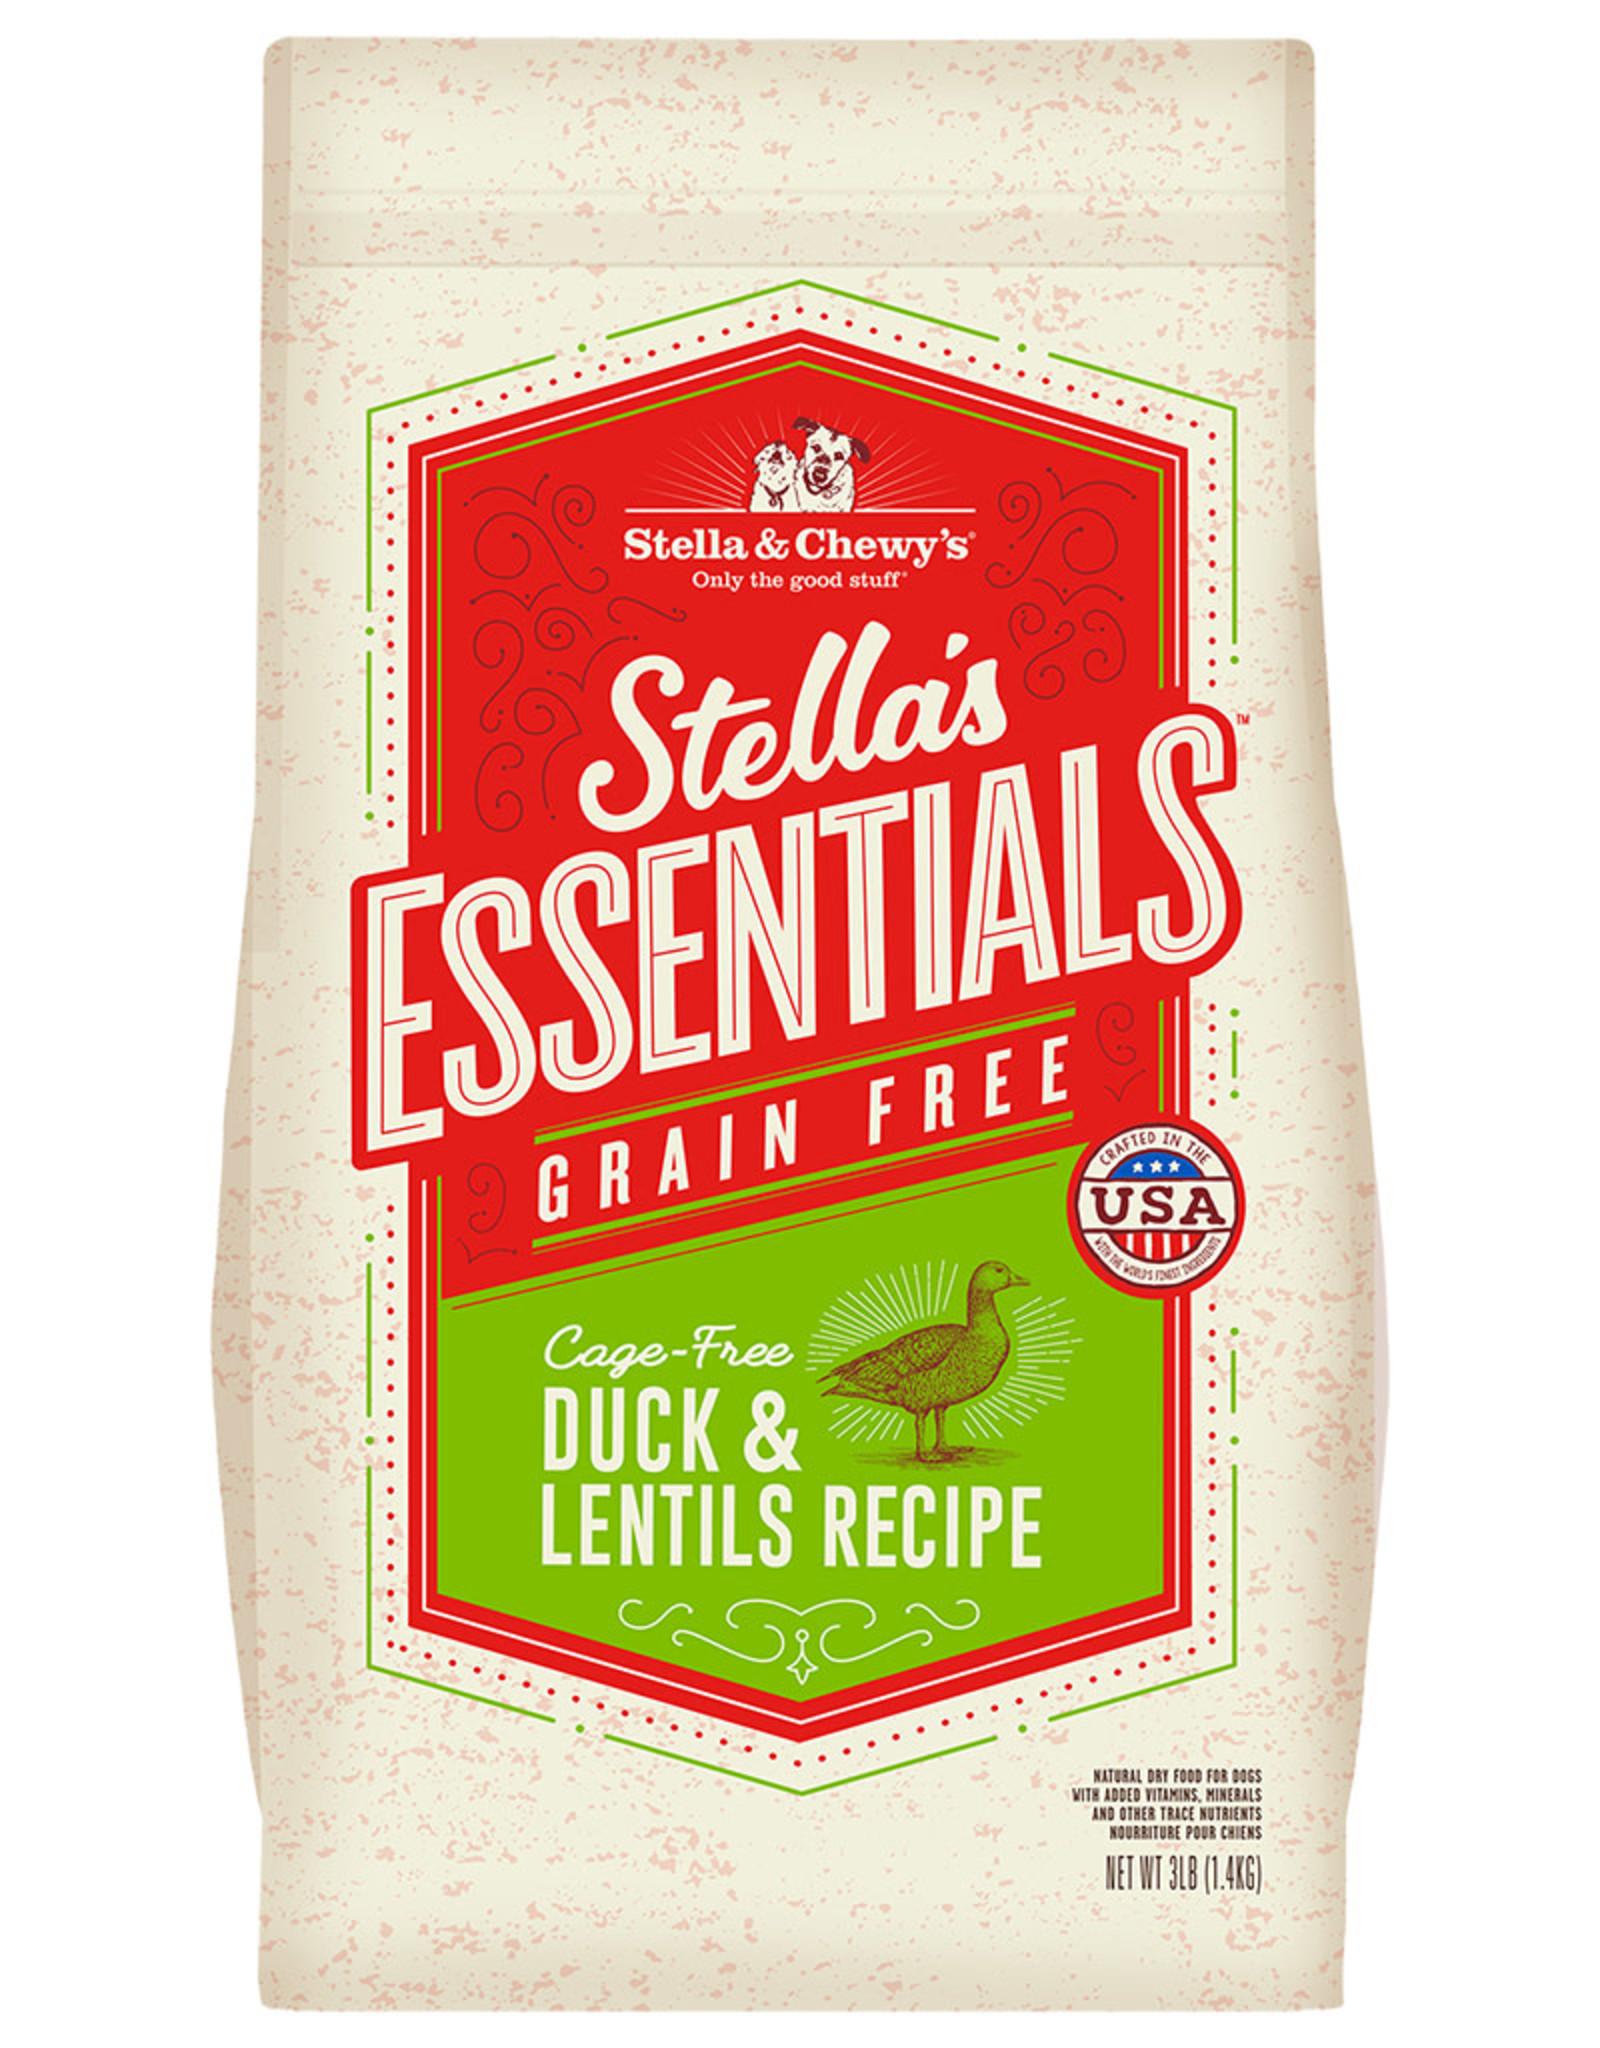 Stella & chewy's SC Essentials Grain Free Duck & Lentils 3LB